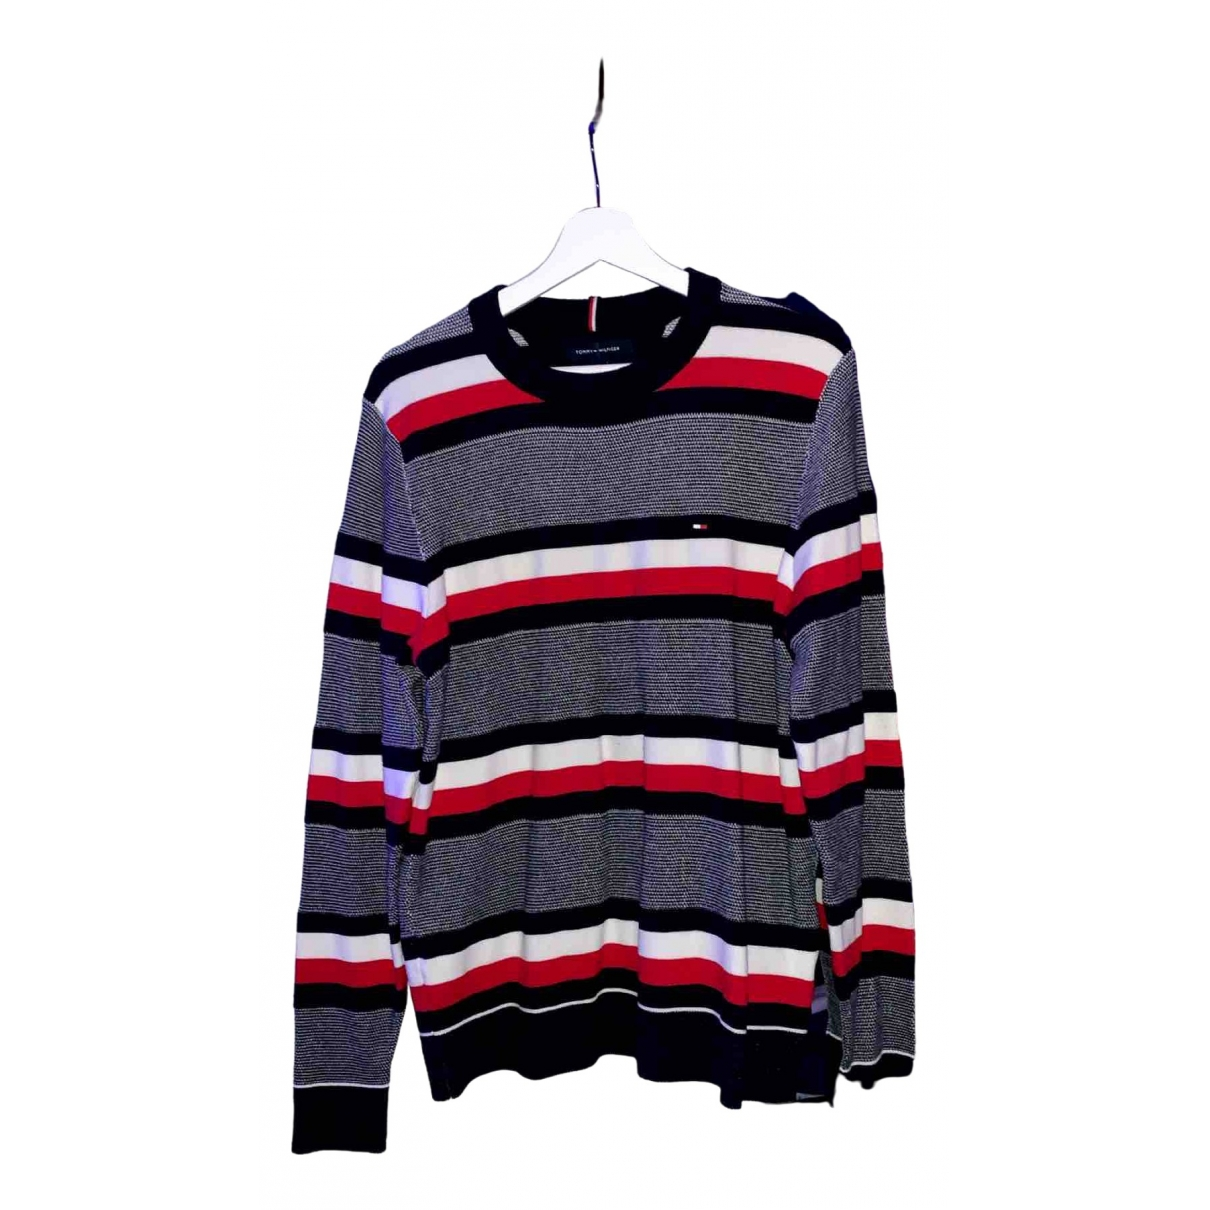 Tommy Hilfiger \N Red Cotton Knitwear & Sweatshirts for Men M International